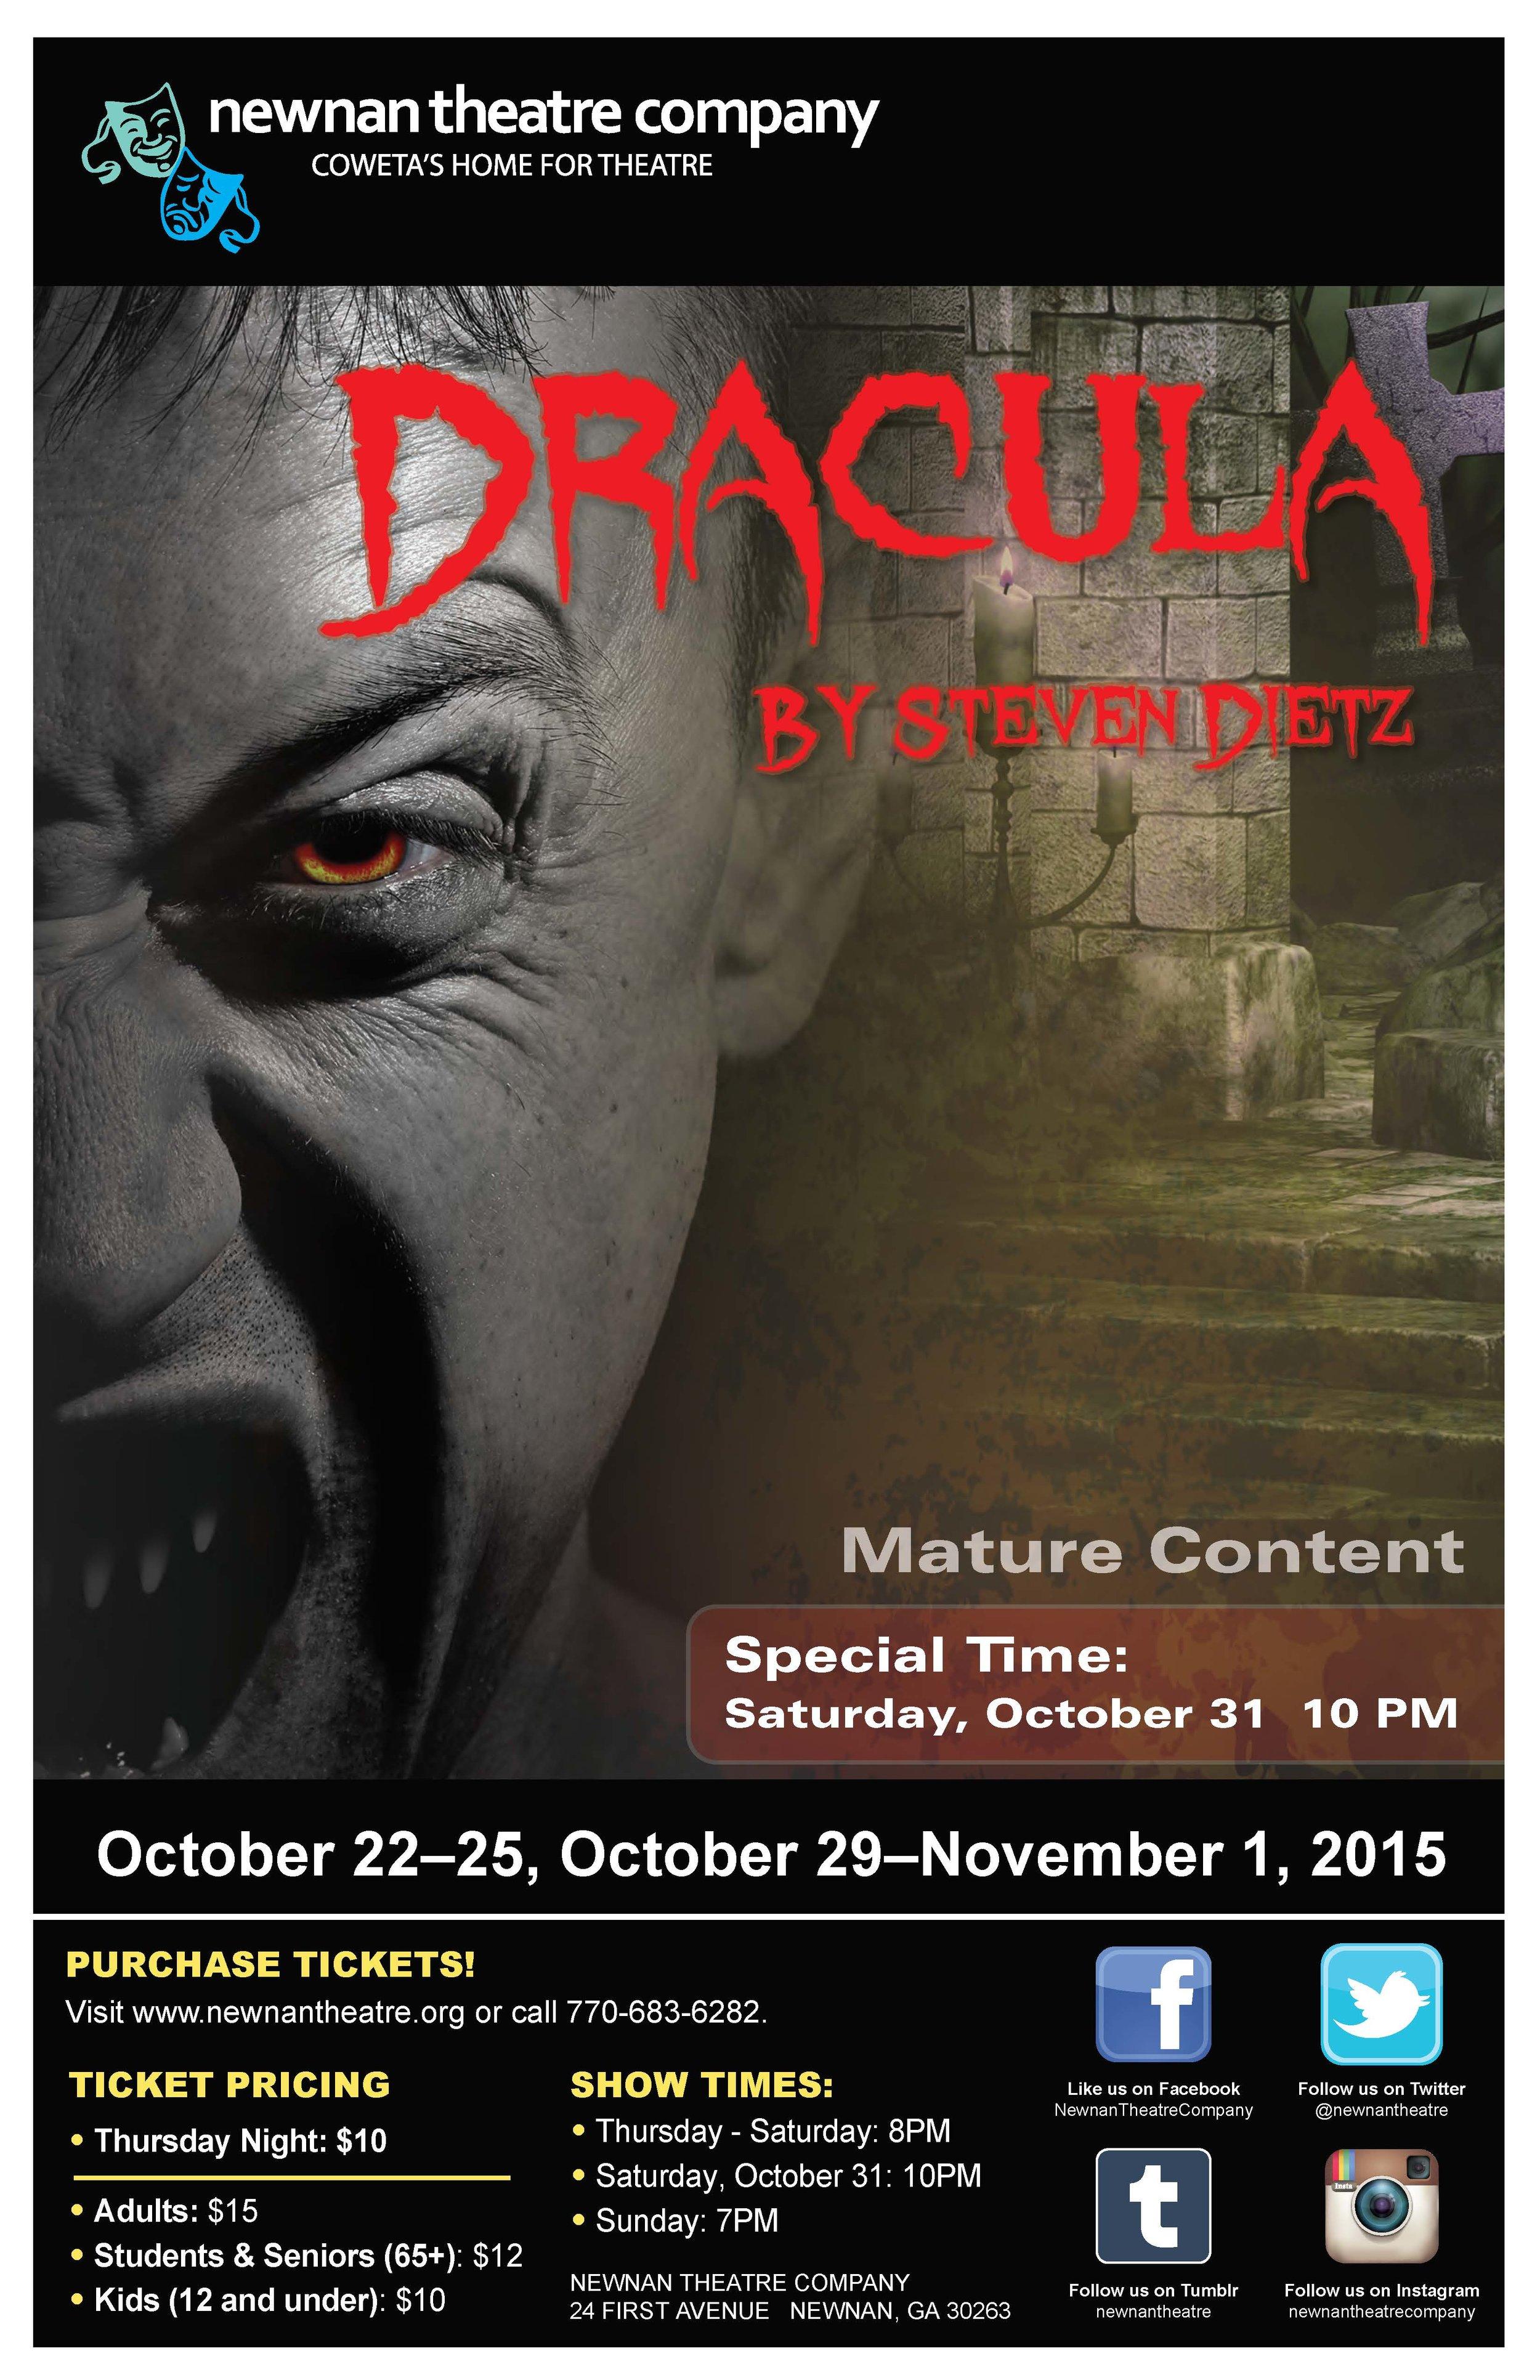 Dracula_11x17 poster.jpg